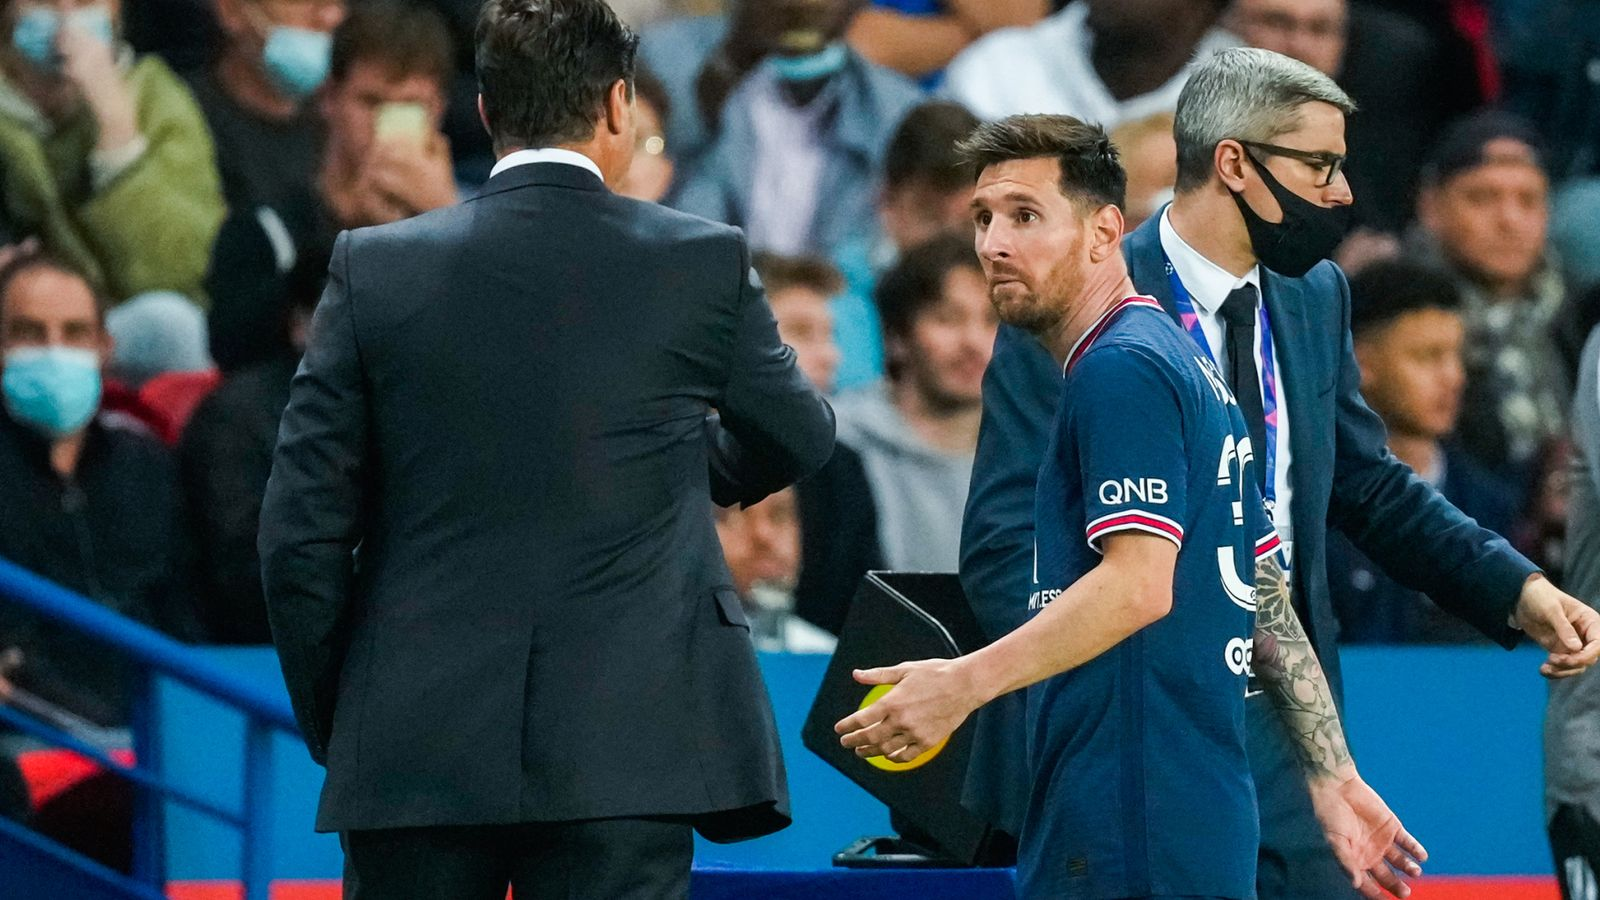 Euro round-up: Mauricio Pochettino defends Lionel Messi sub in late PSG win, Real Madrid produce late comeback and more - Sky Sports